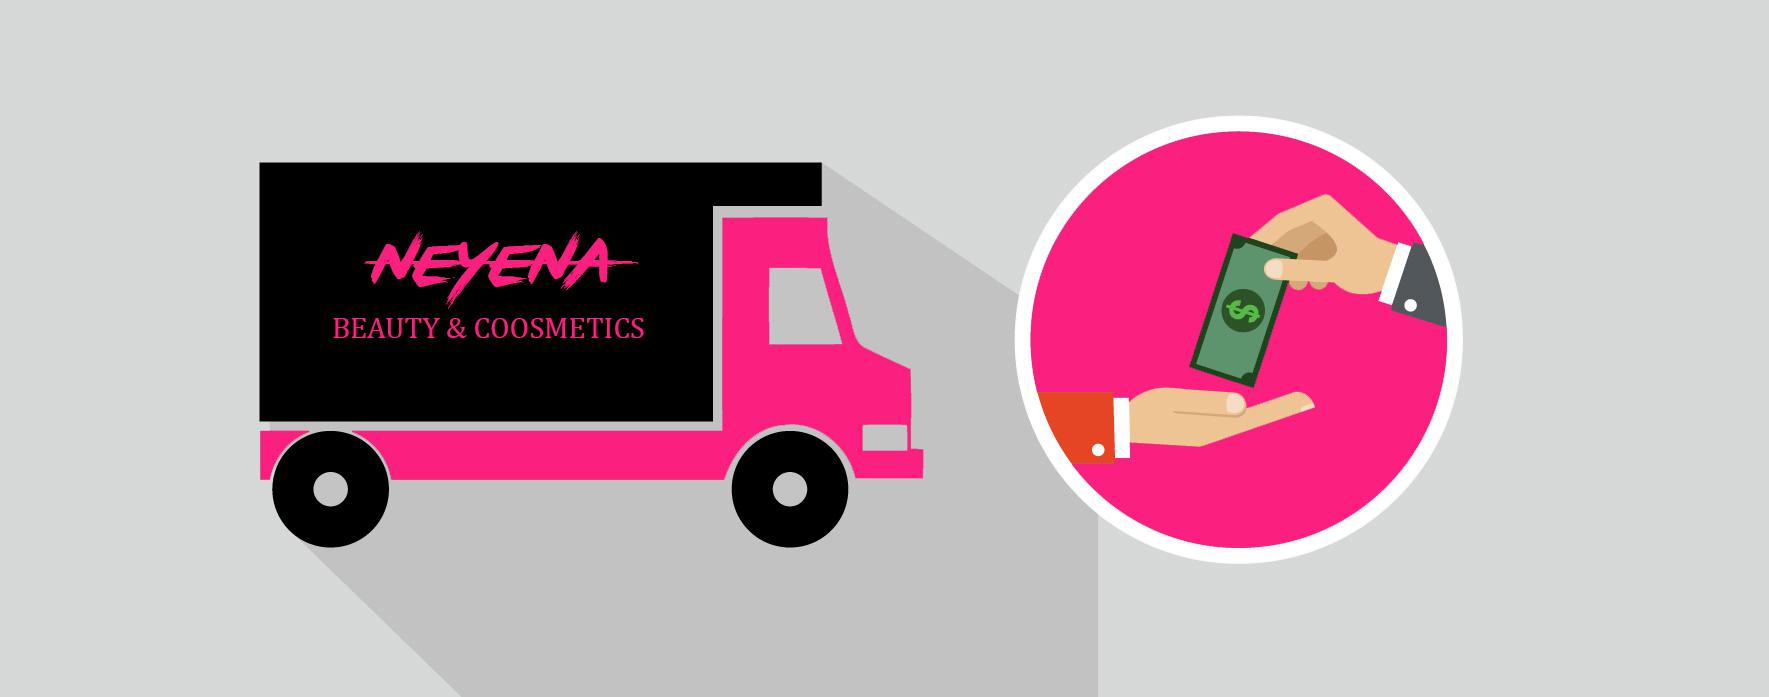 Neyena Beauty & Neyena Cosmetics | Cash on Delivery | Free Shipping | Bridal Makeup Kit